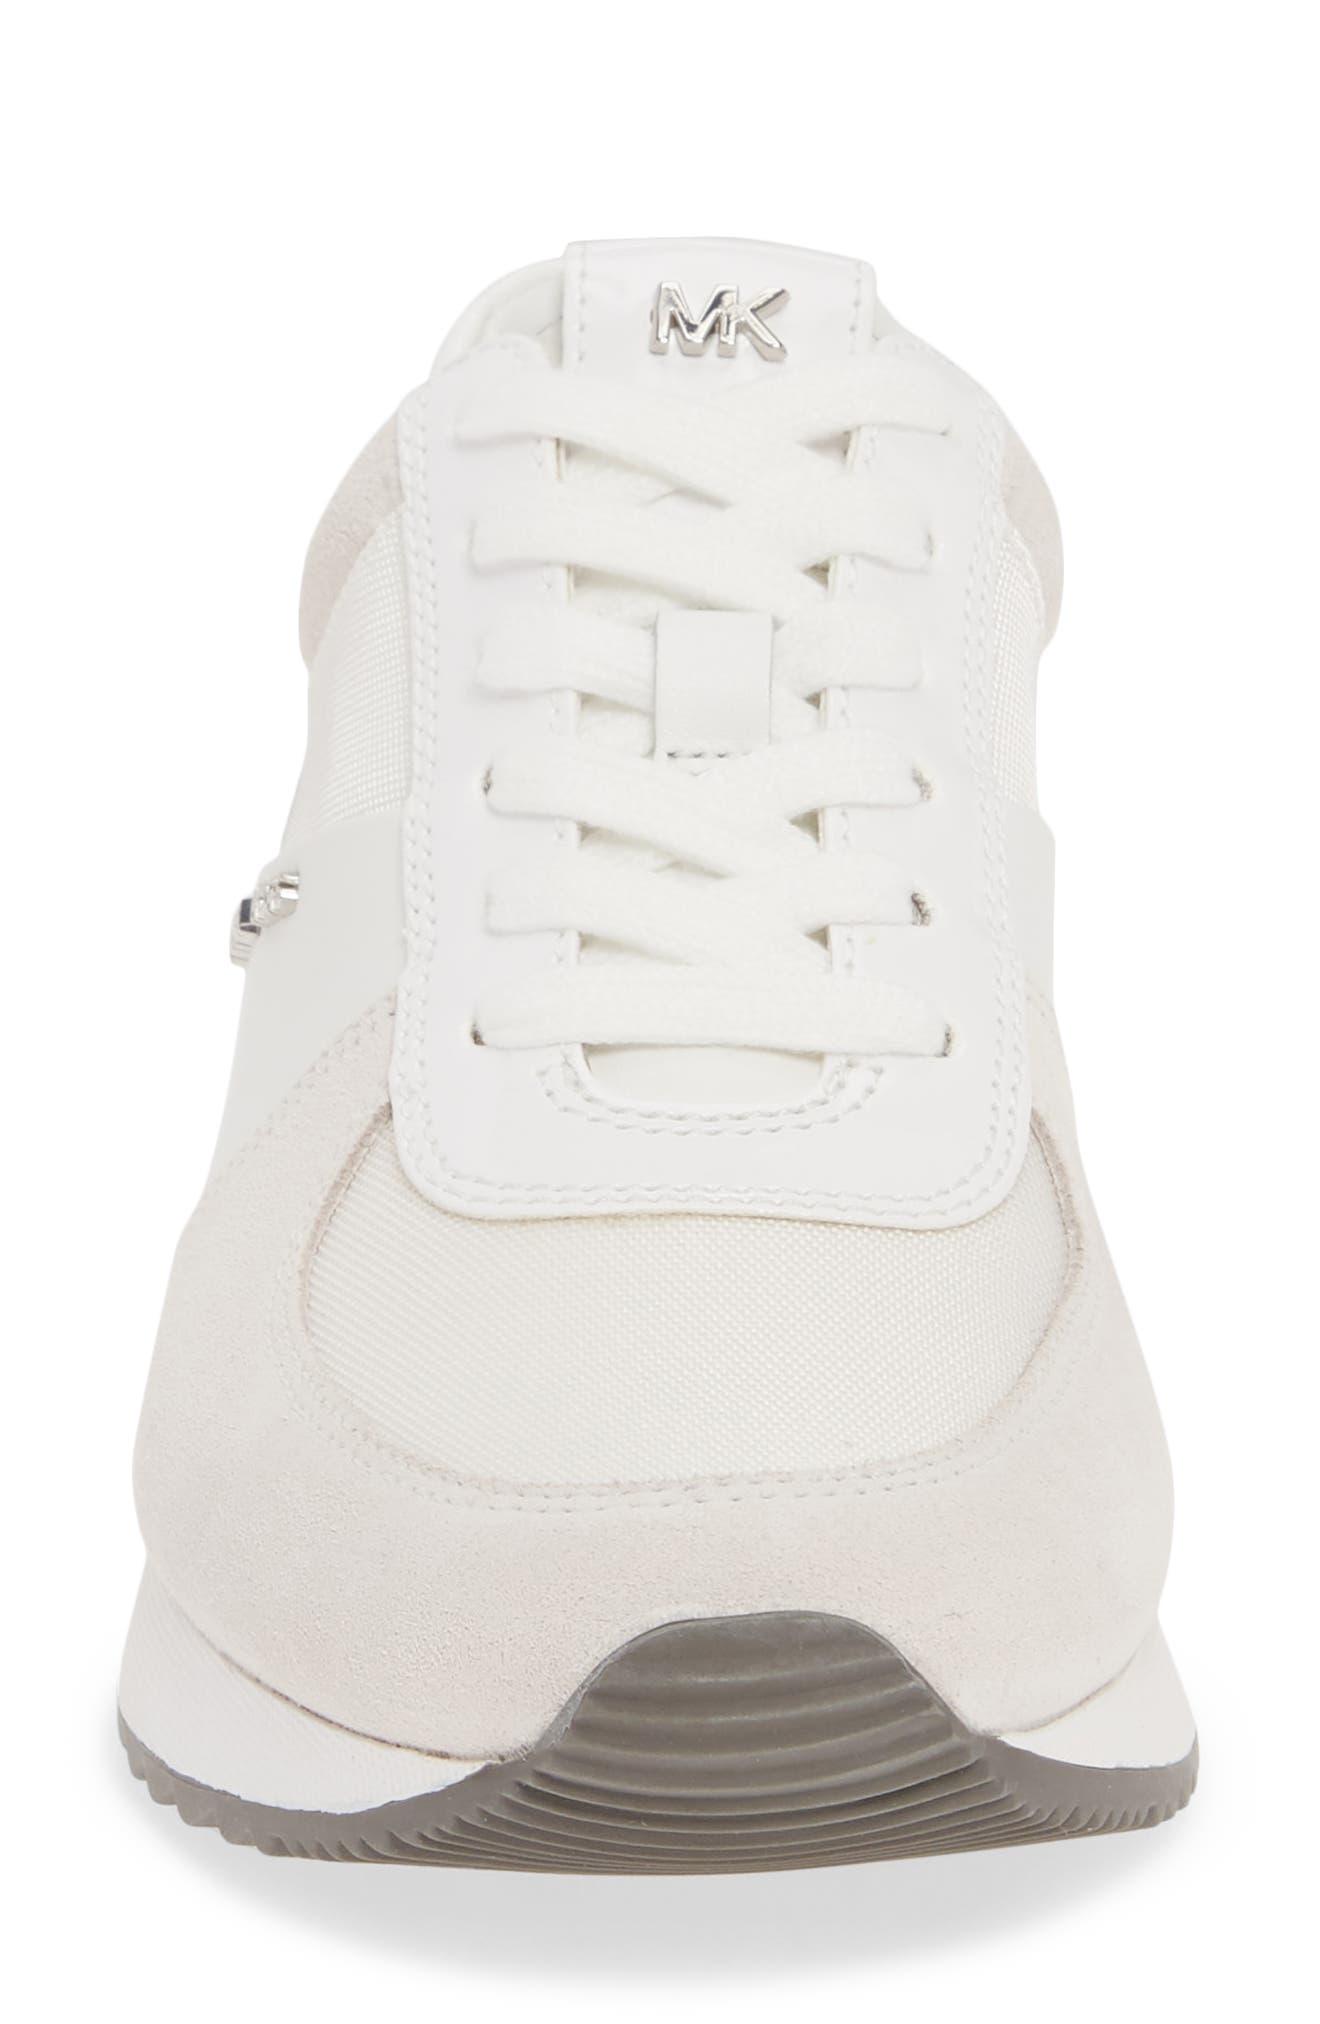 MICHAEL MICHAEL KORS, 'Allie' Sneaker, Alternate thumbnail 4, color, OPTIC WHITE LEATHER/ CANVAS